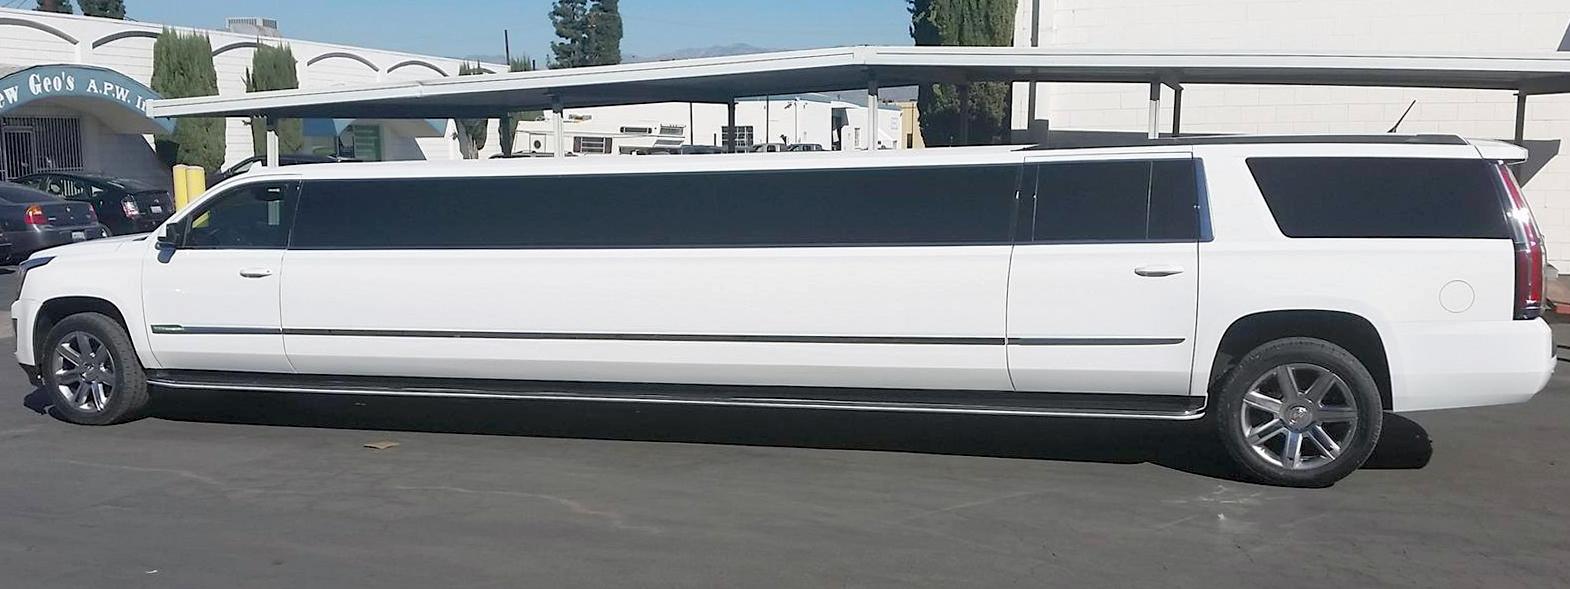 Cadillac Escalade Limousine side